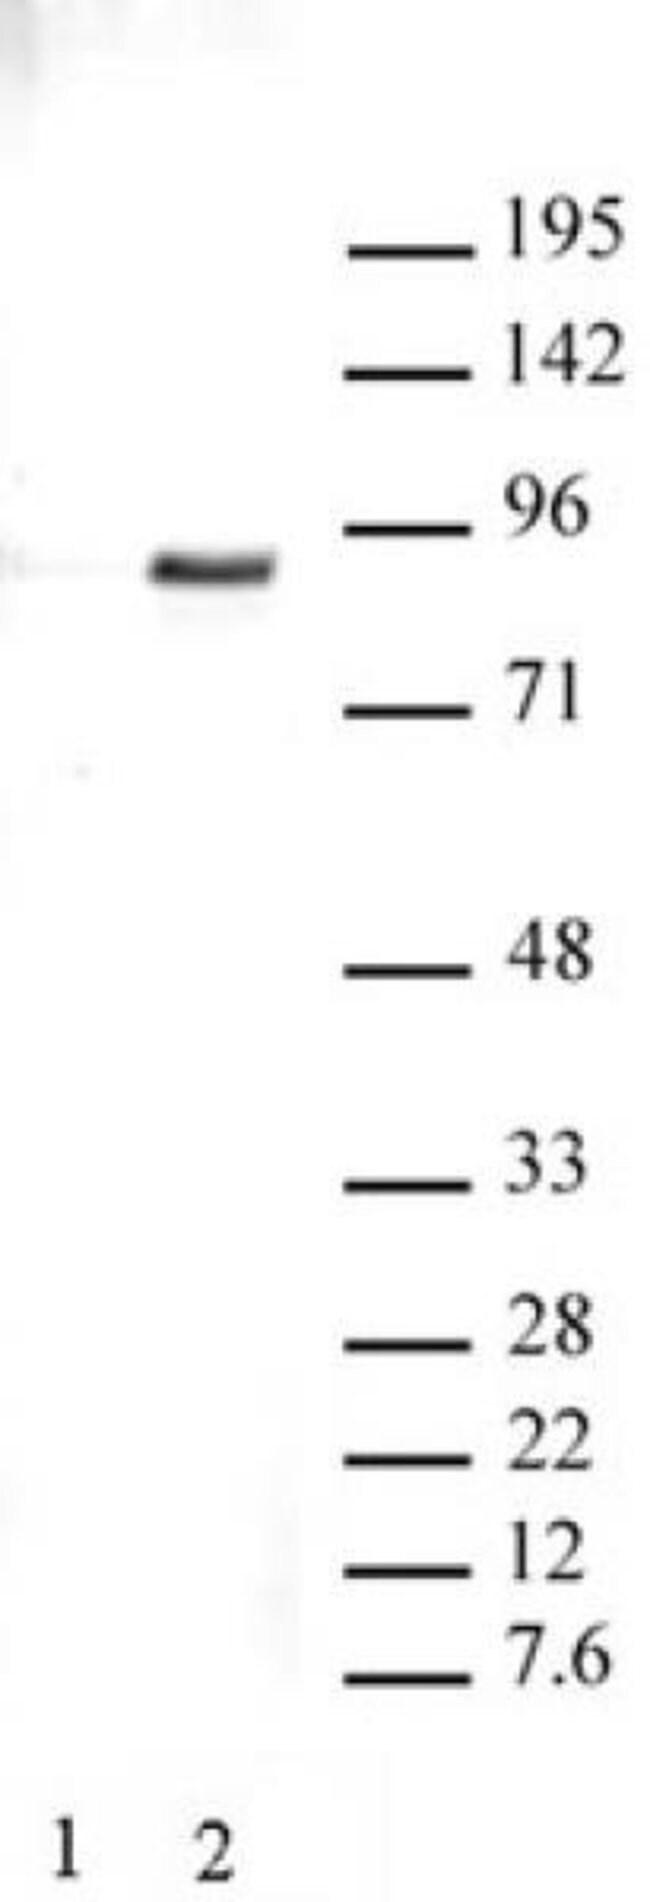 Phospho-STAT3 (Tyr705) Rabbit anti-Human, Unconjugated, Polyclonal, Active